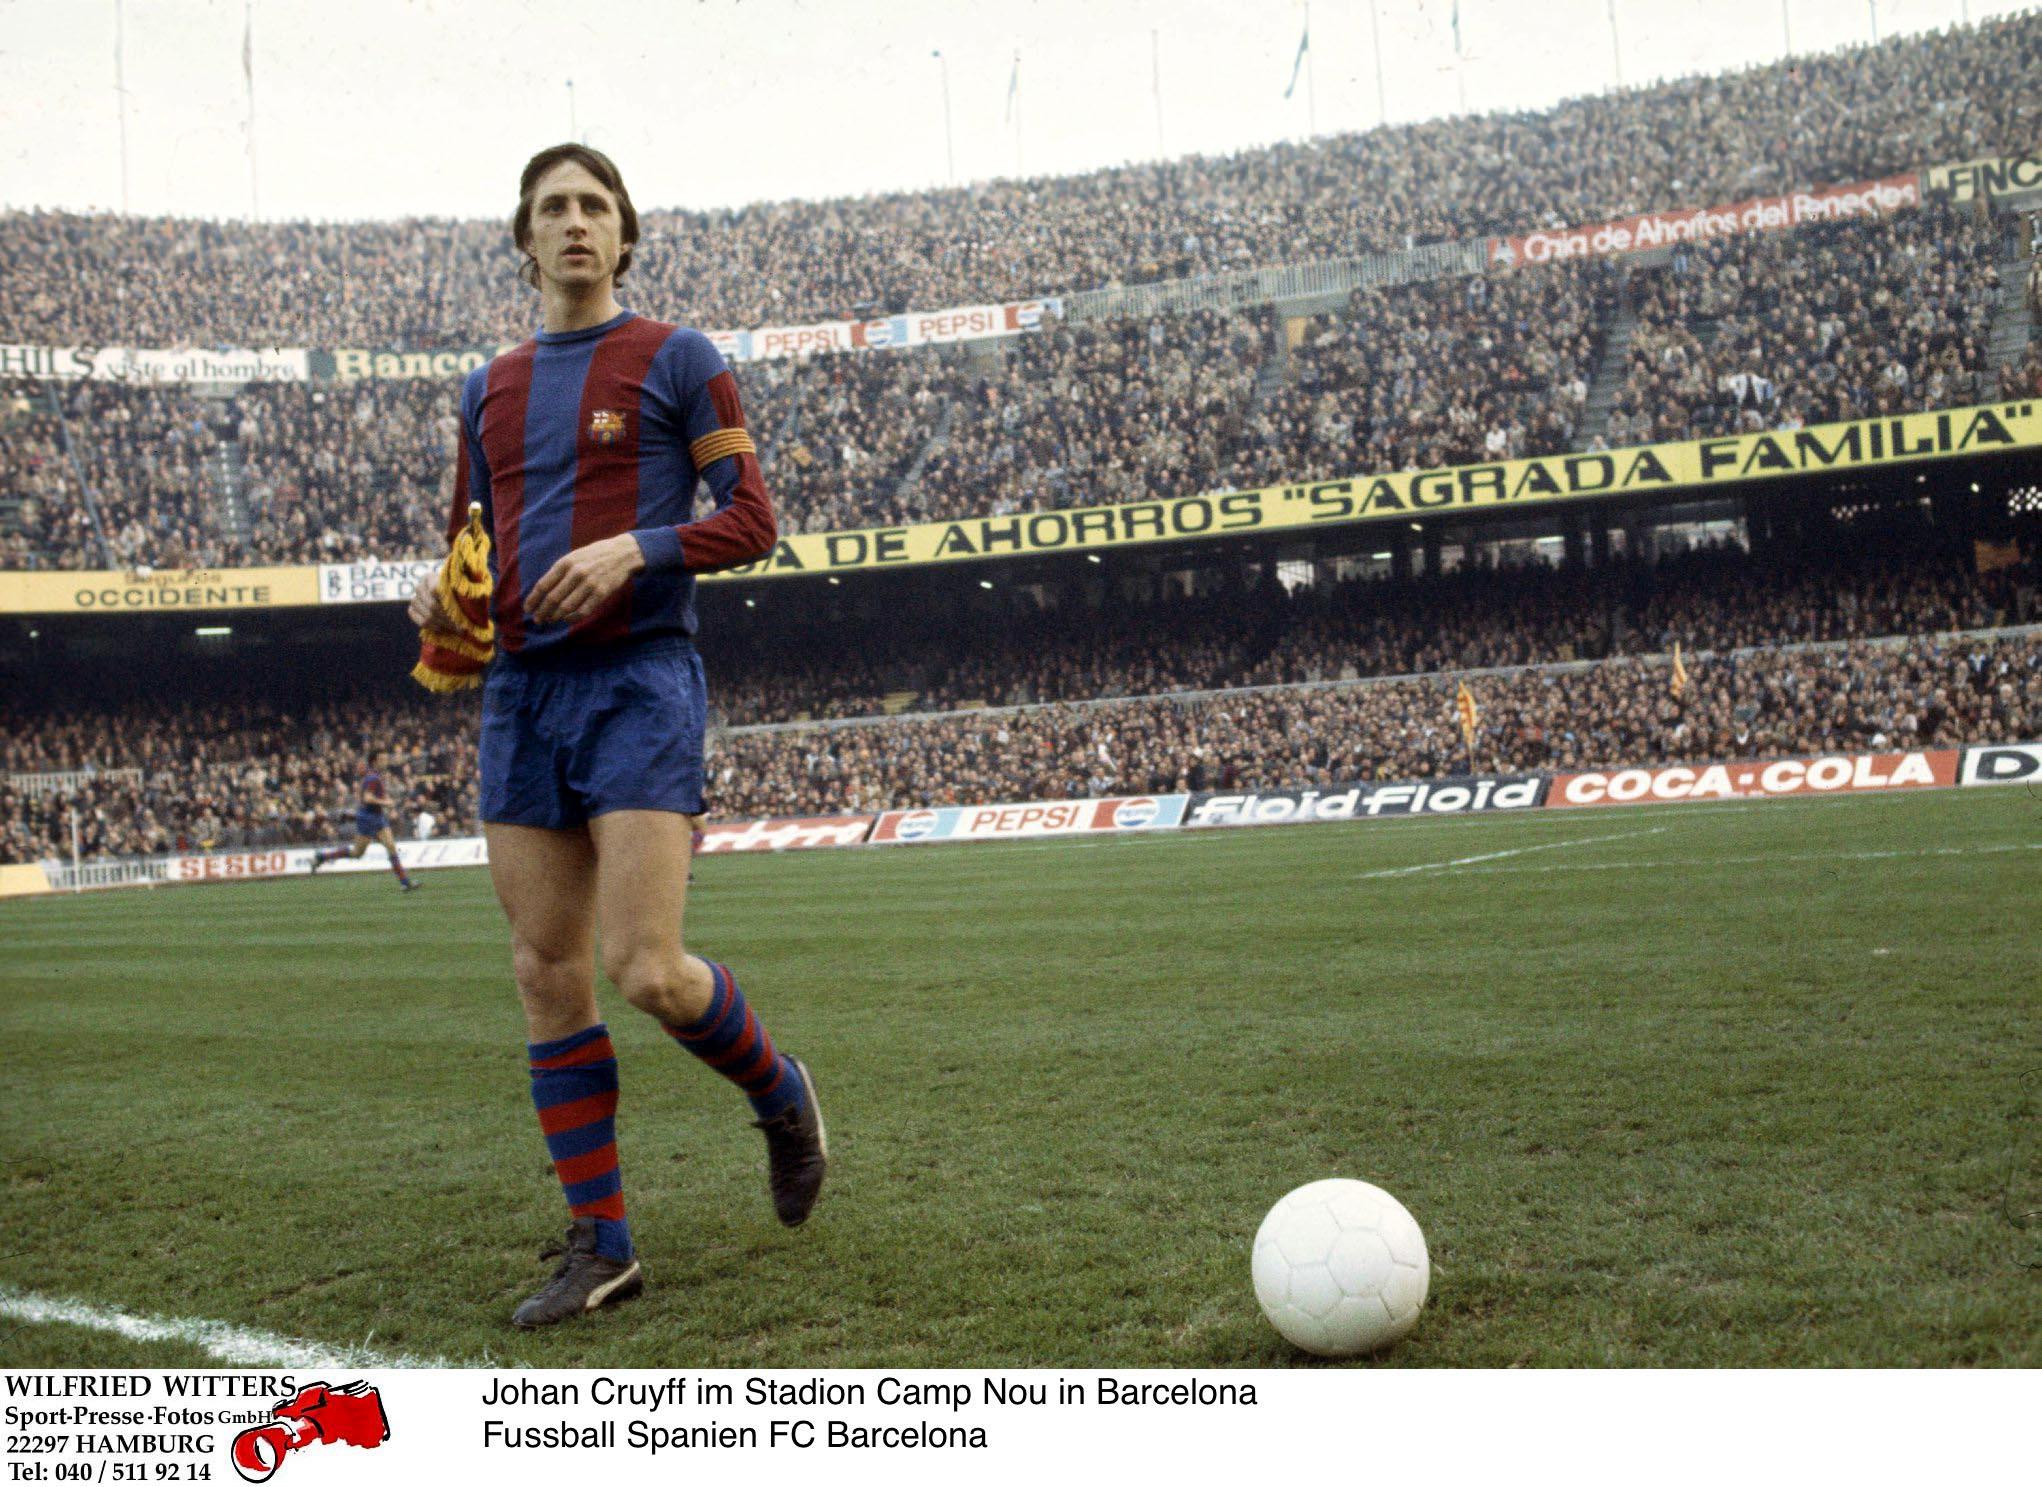 Johan Cruyff – an appreciation